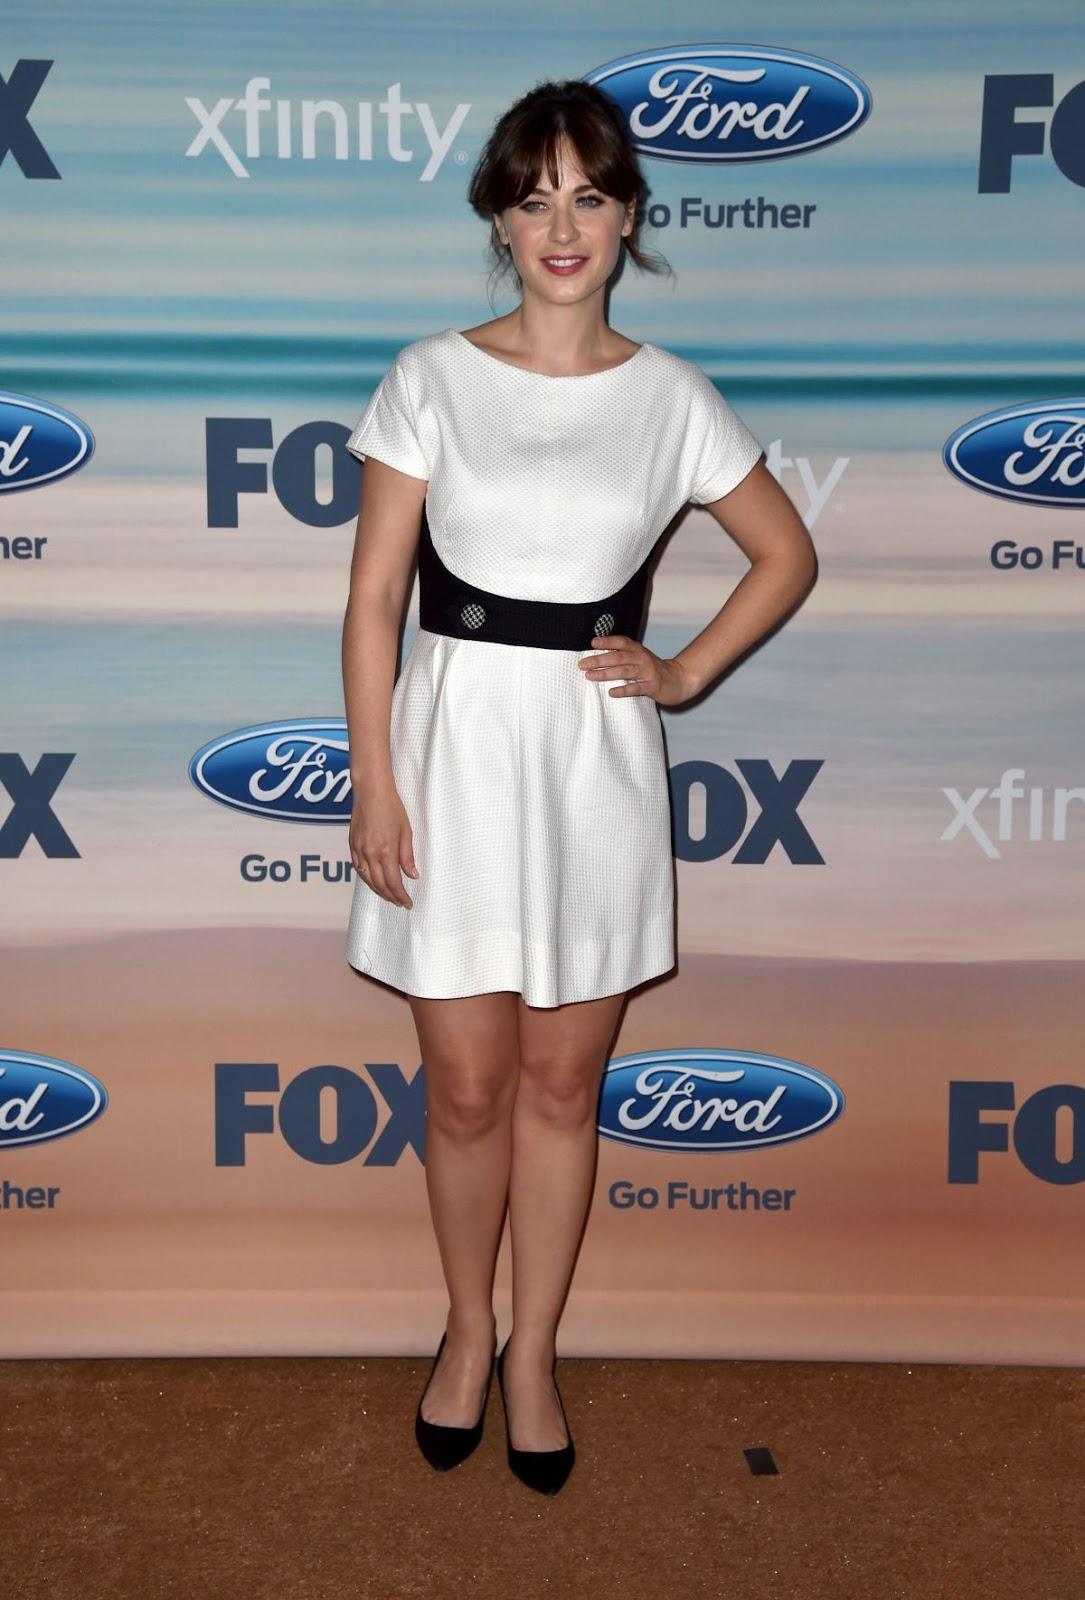 Full HQ Photos of Zooey Deschanel at Fox Fall ECO Casino 2014 Party in Santa Monica